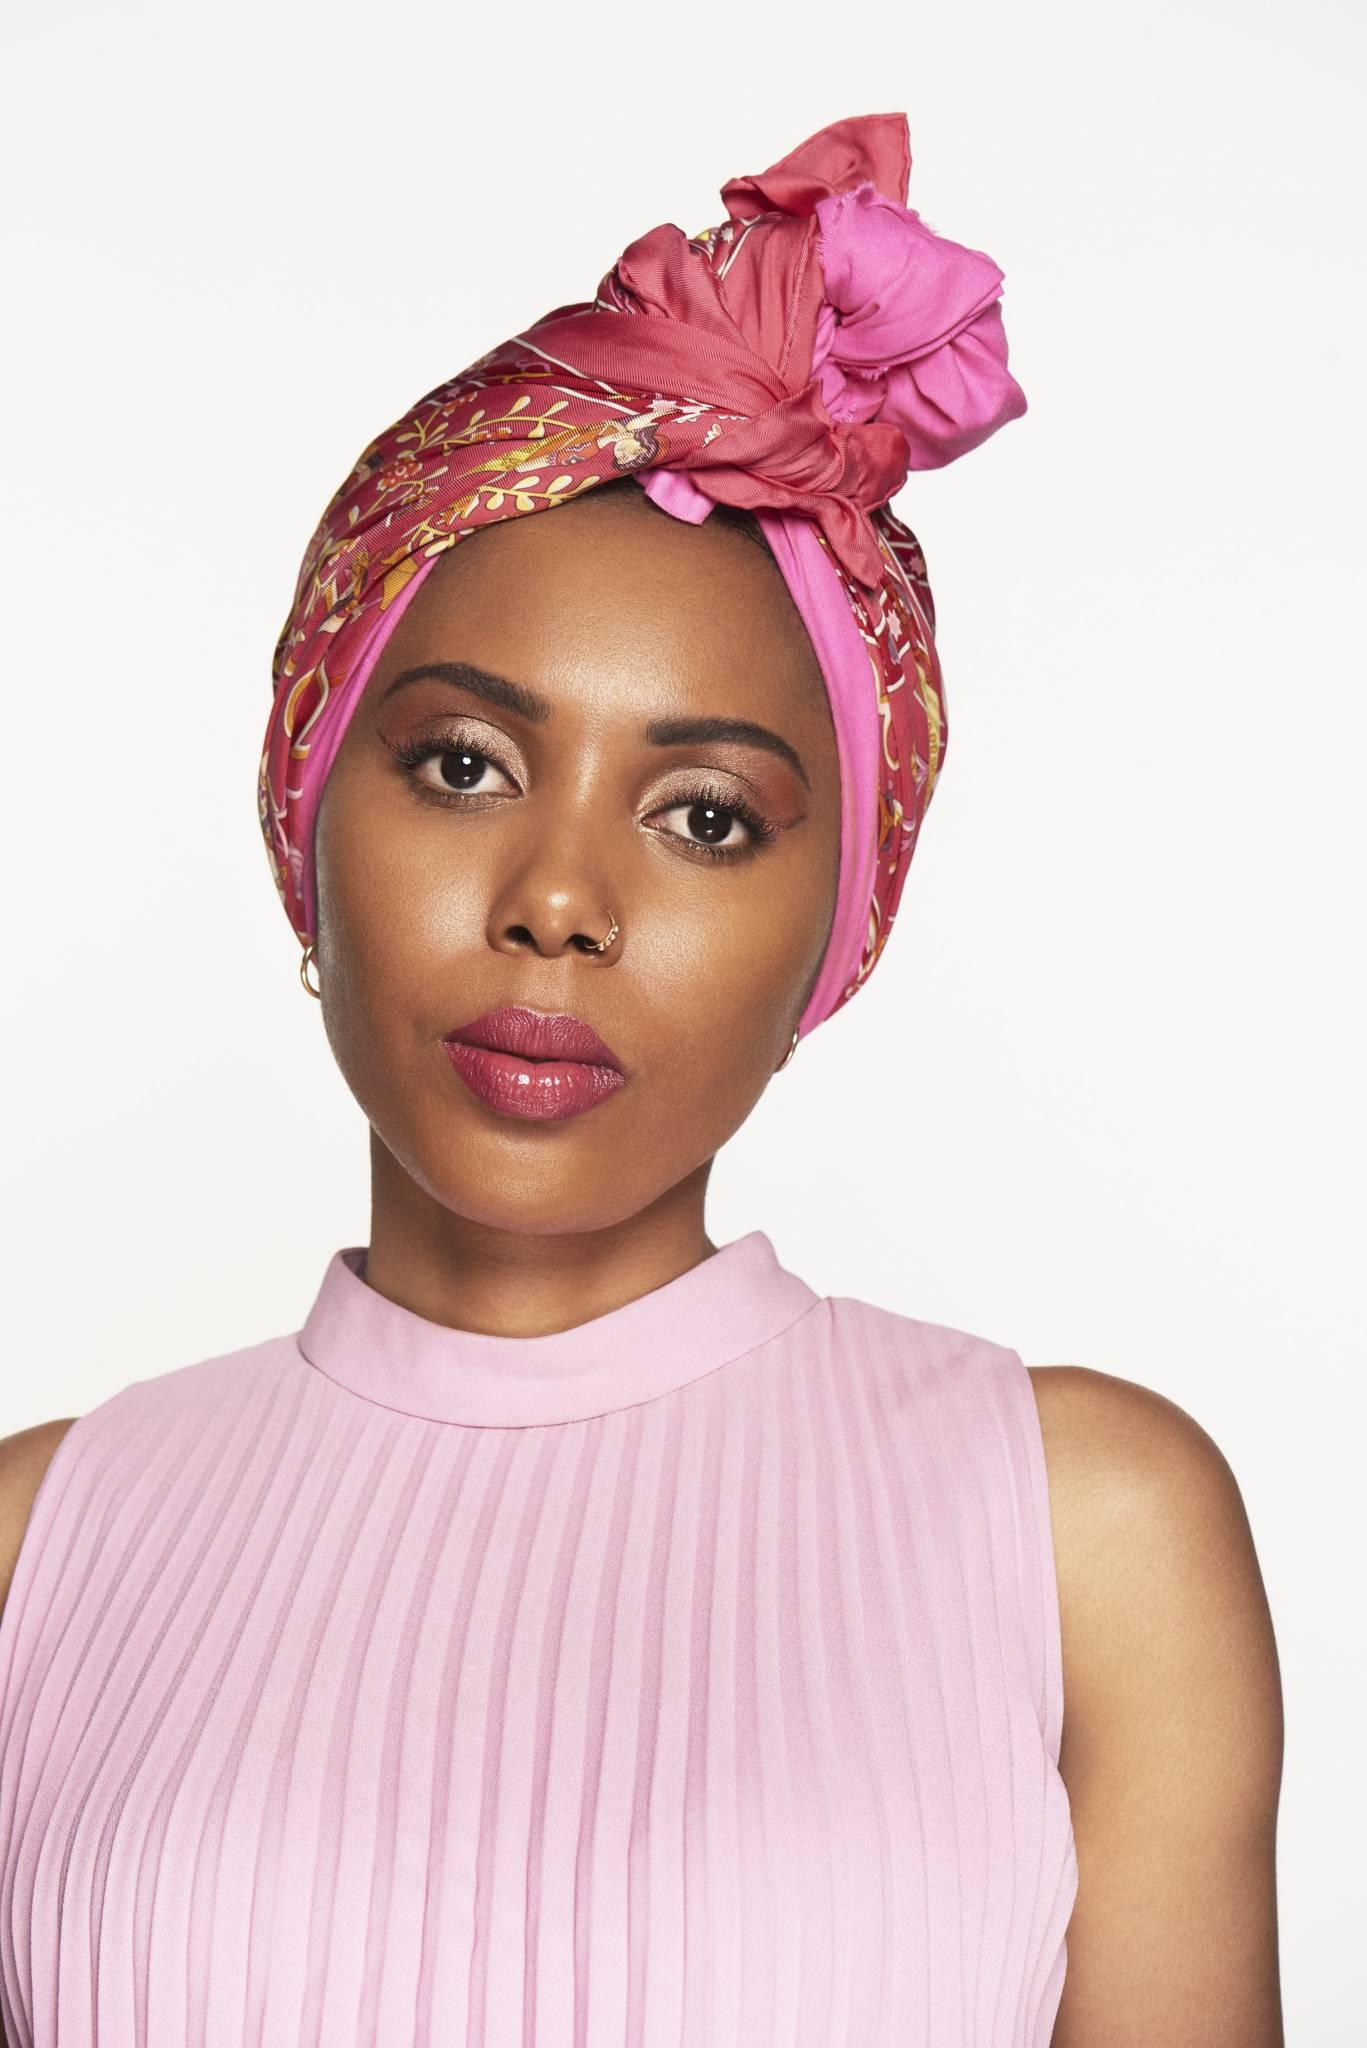 Nowa ambasadorka L'Oréal - kim jest Jaha Dukureh?